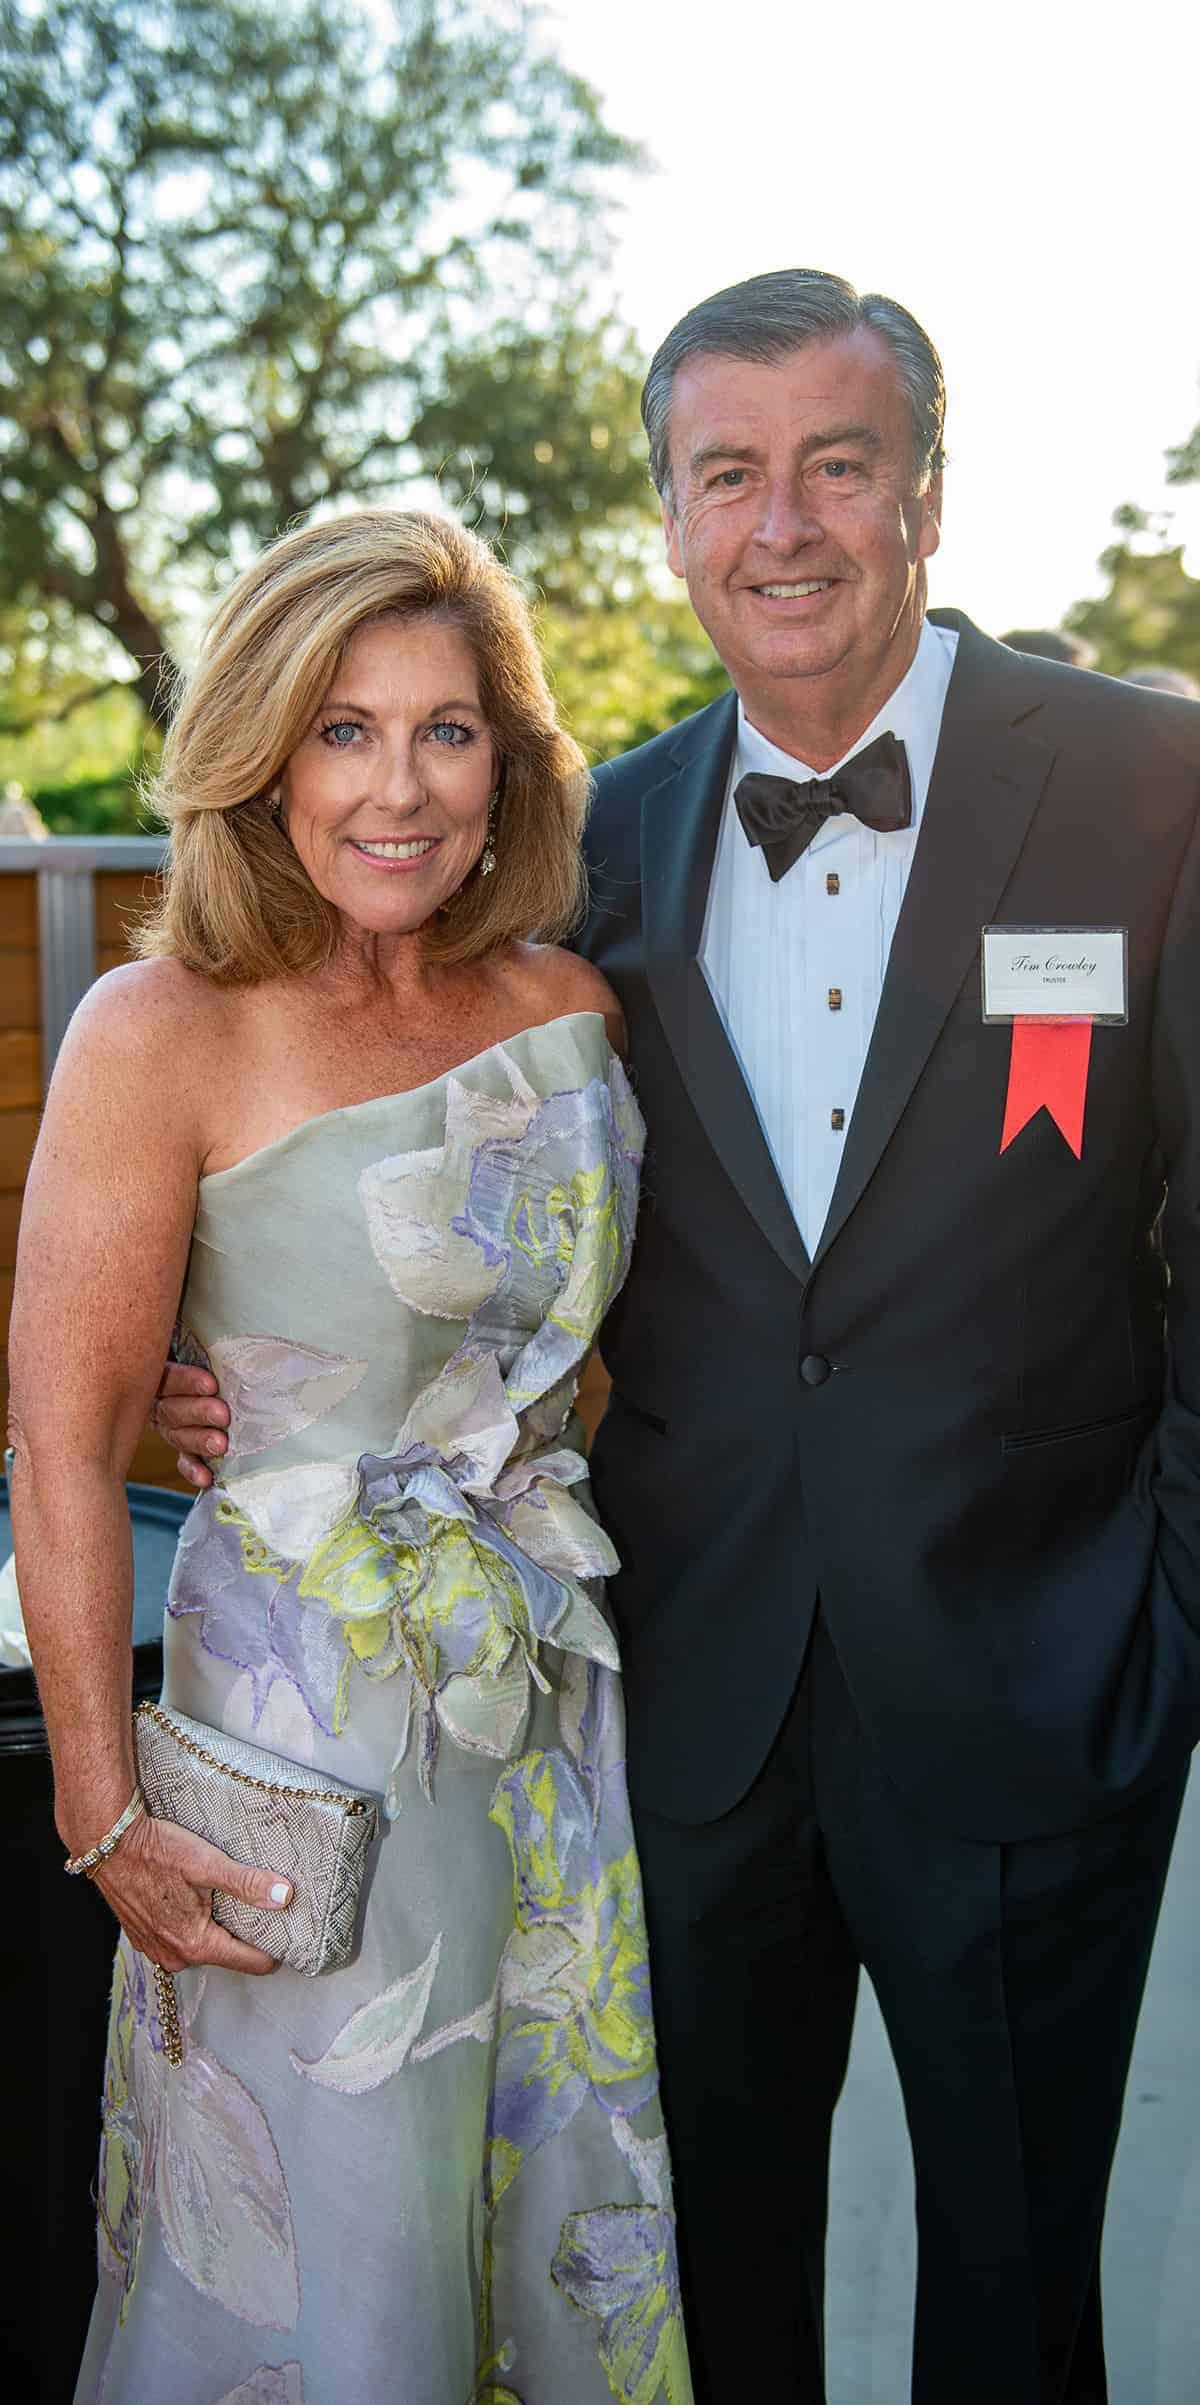 Carol and Tim Crowley